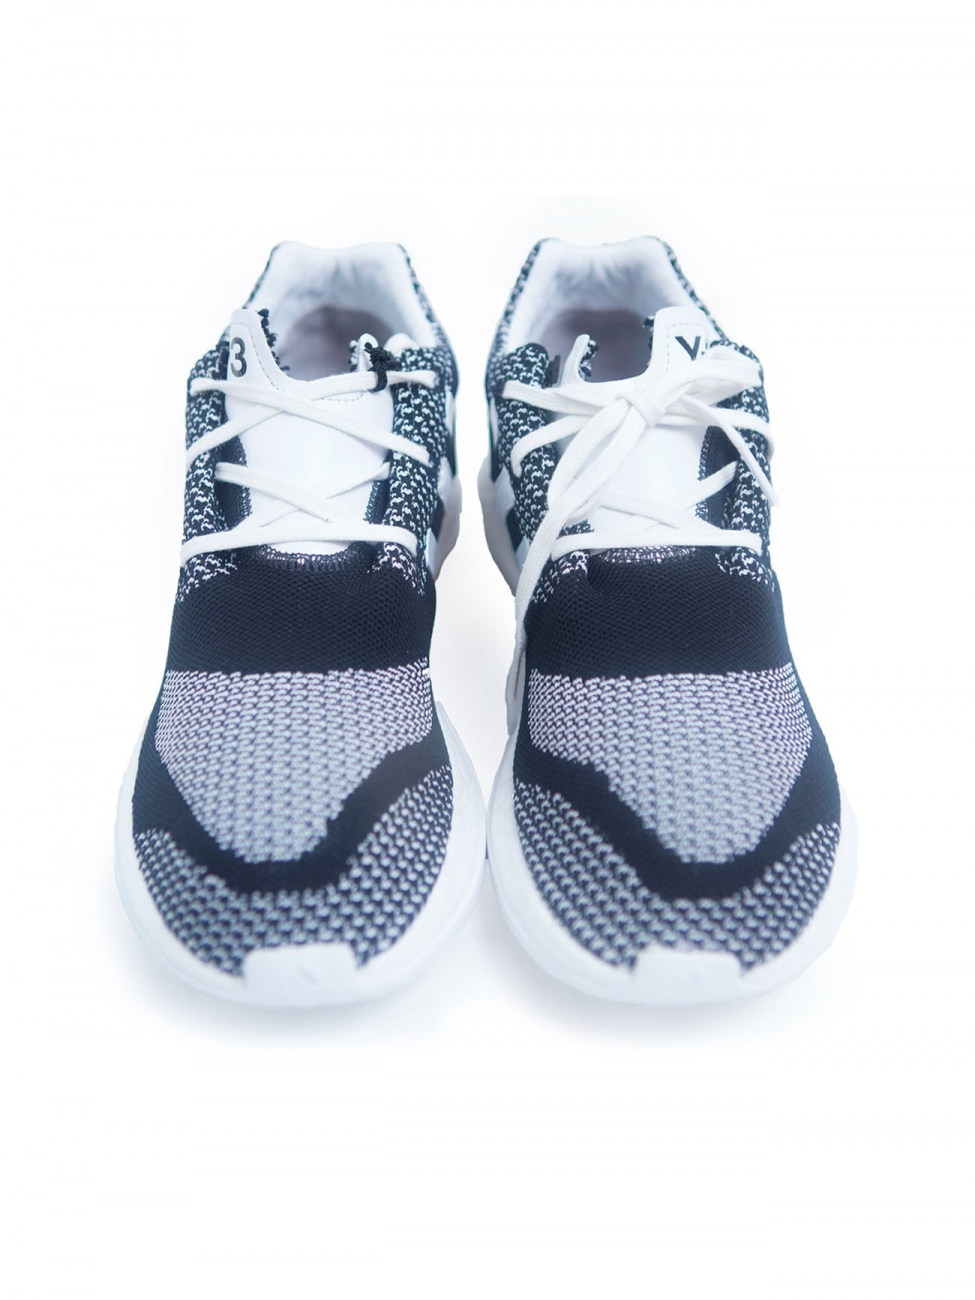 5f33ab960 Adidas Y3 Pure Boost Zg Knit Black White los-granados-apartment.co.uk